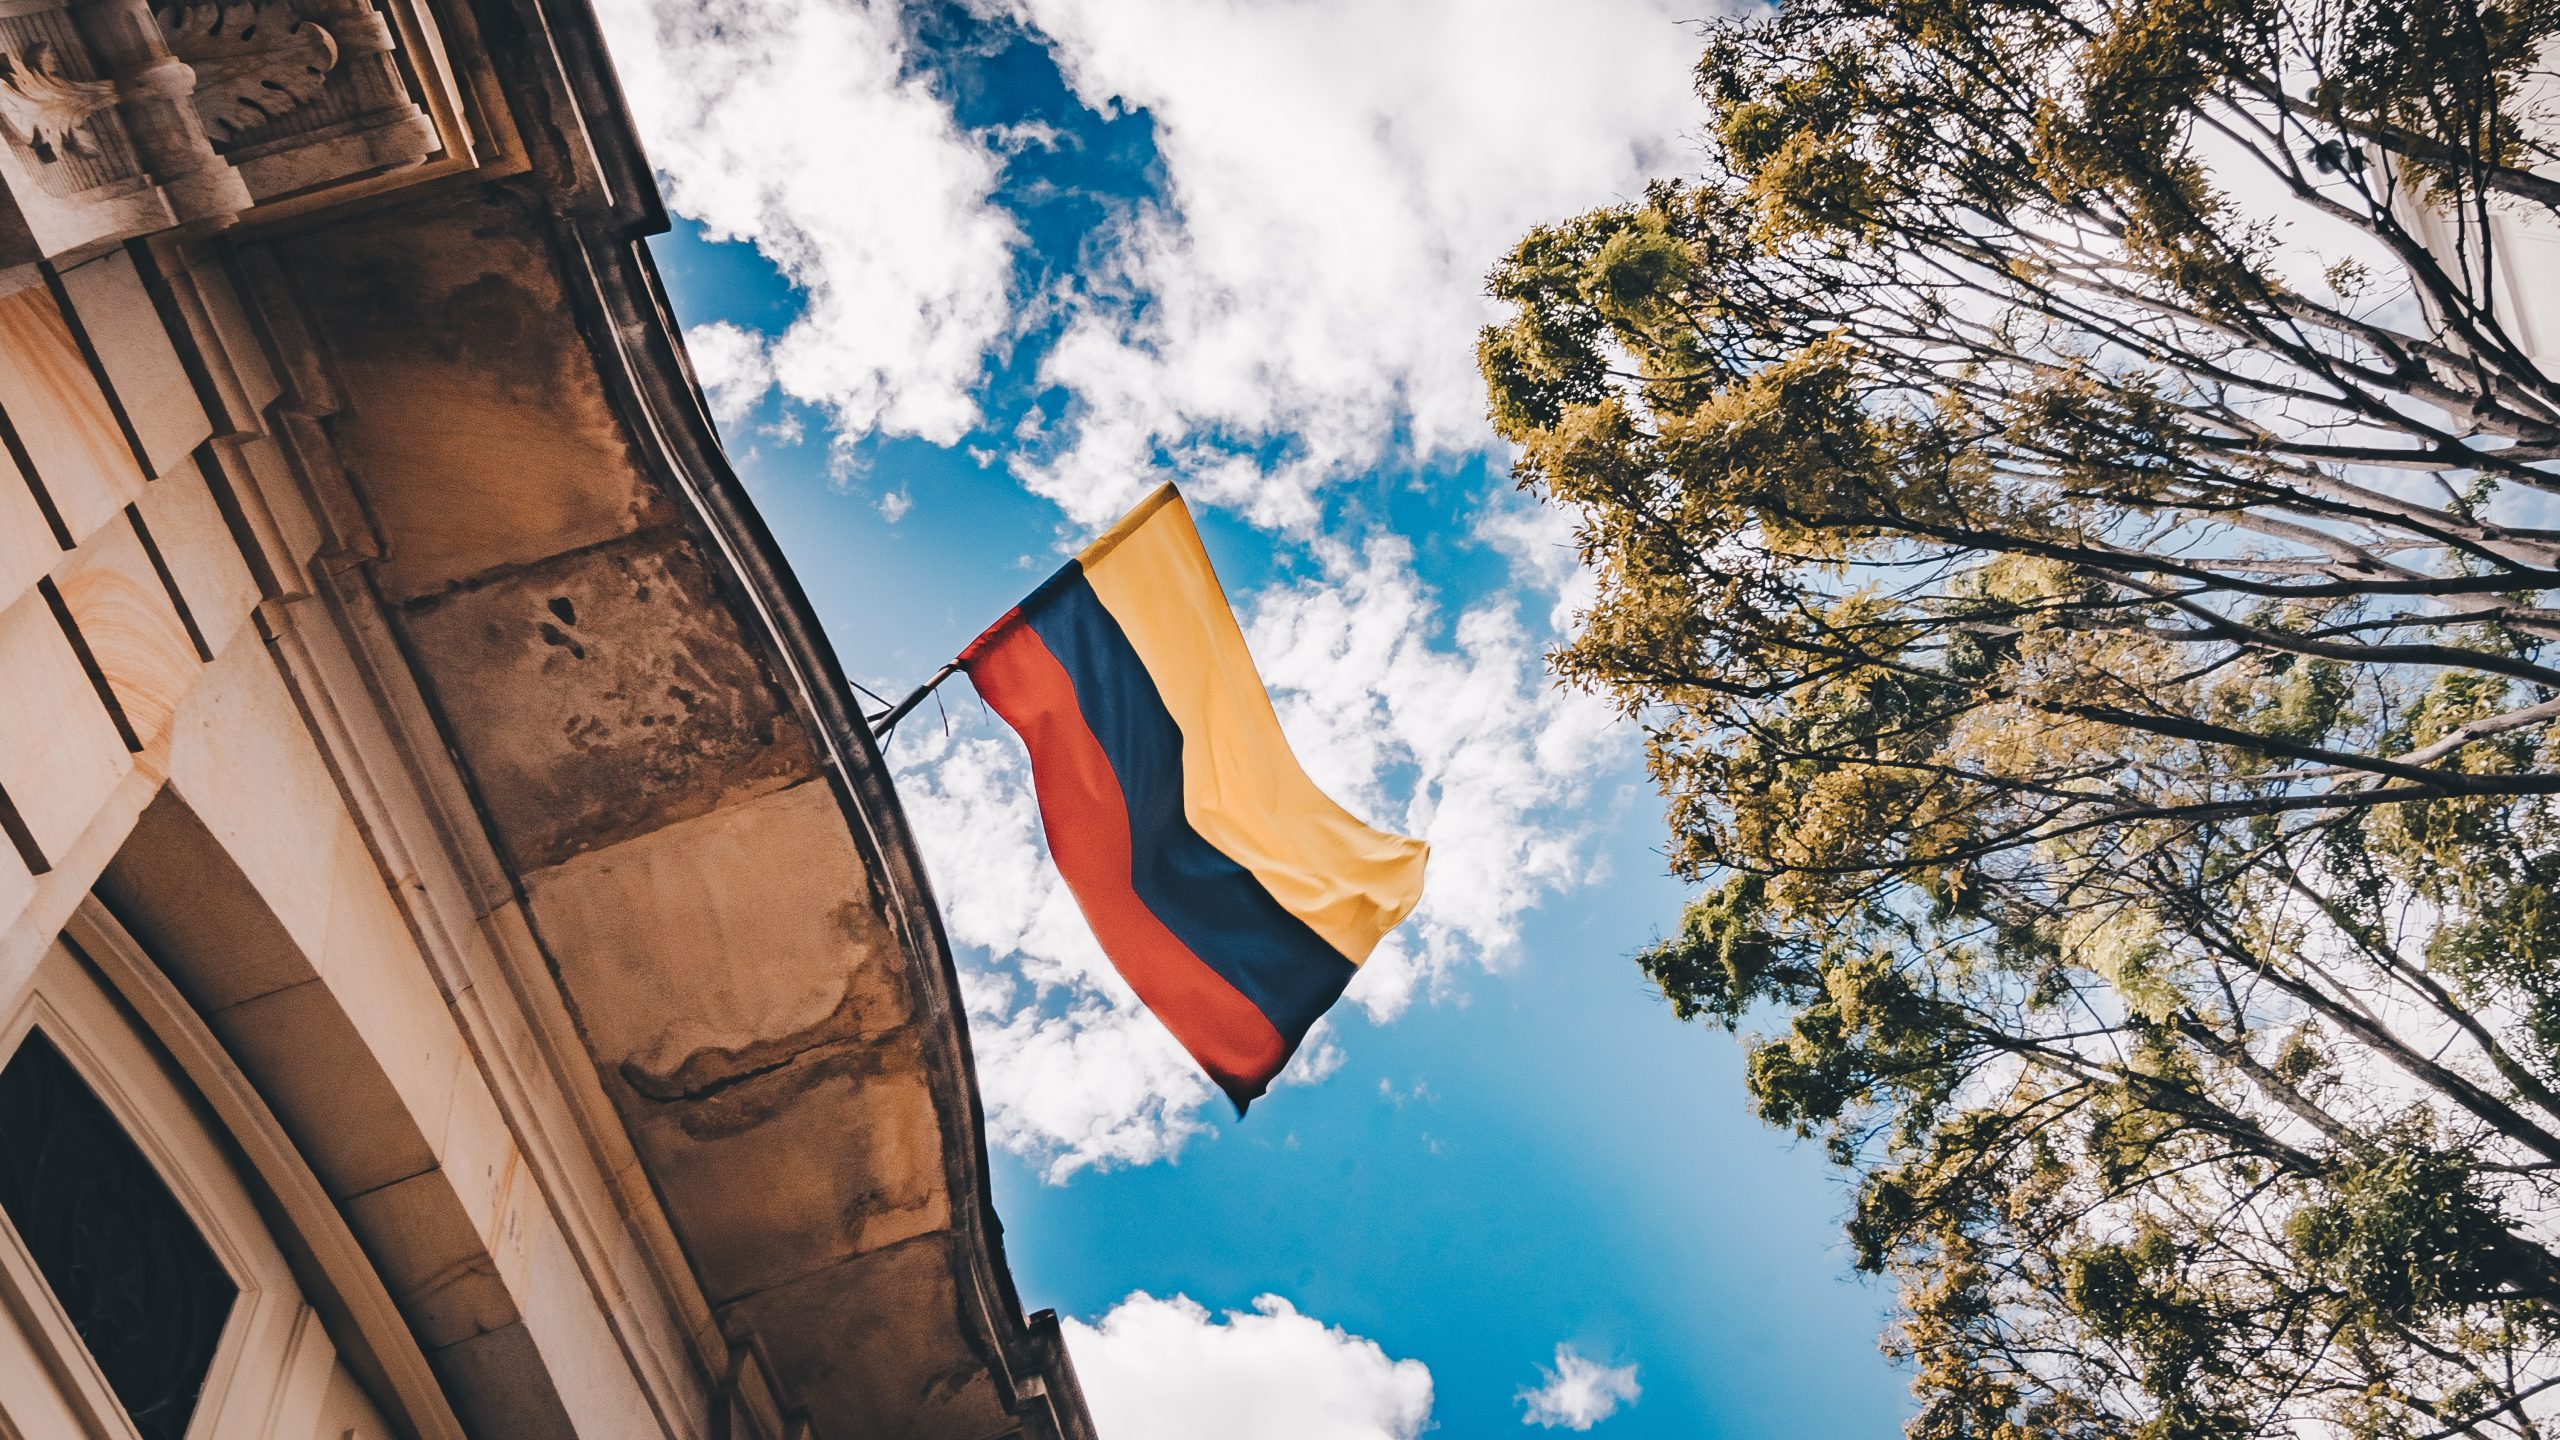 Image of Colomnbian flag flying against a blue sky.